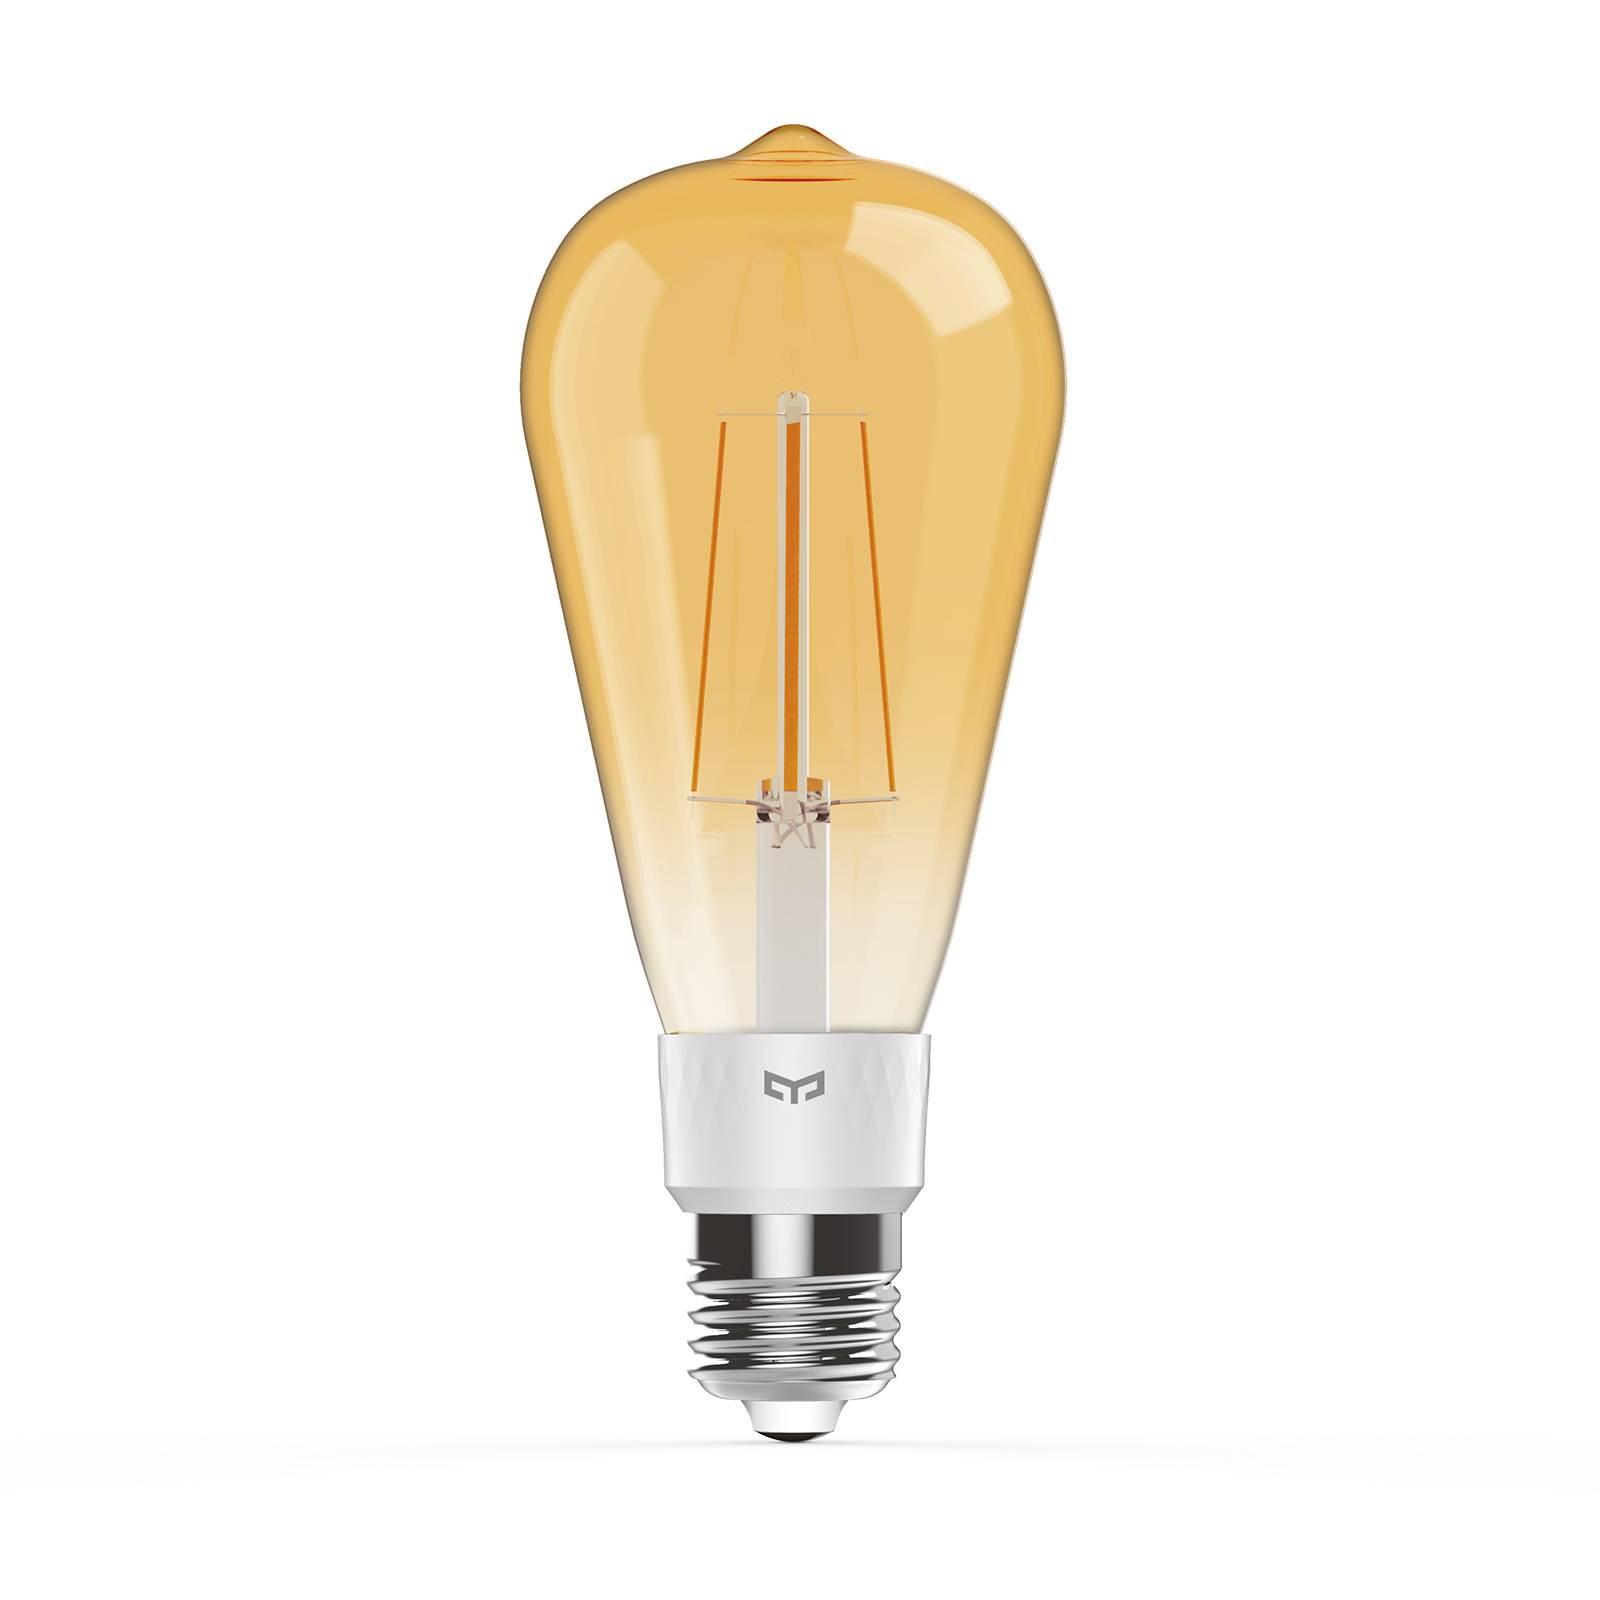 Yeelight Smart-LED-lamppu E27 6W Filament 2 000 K